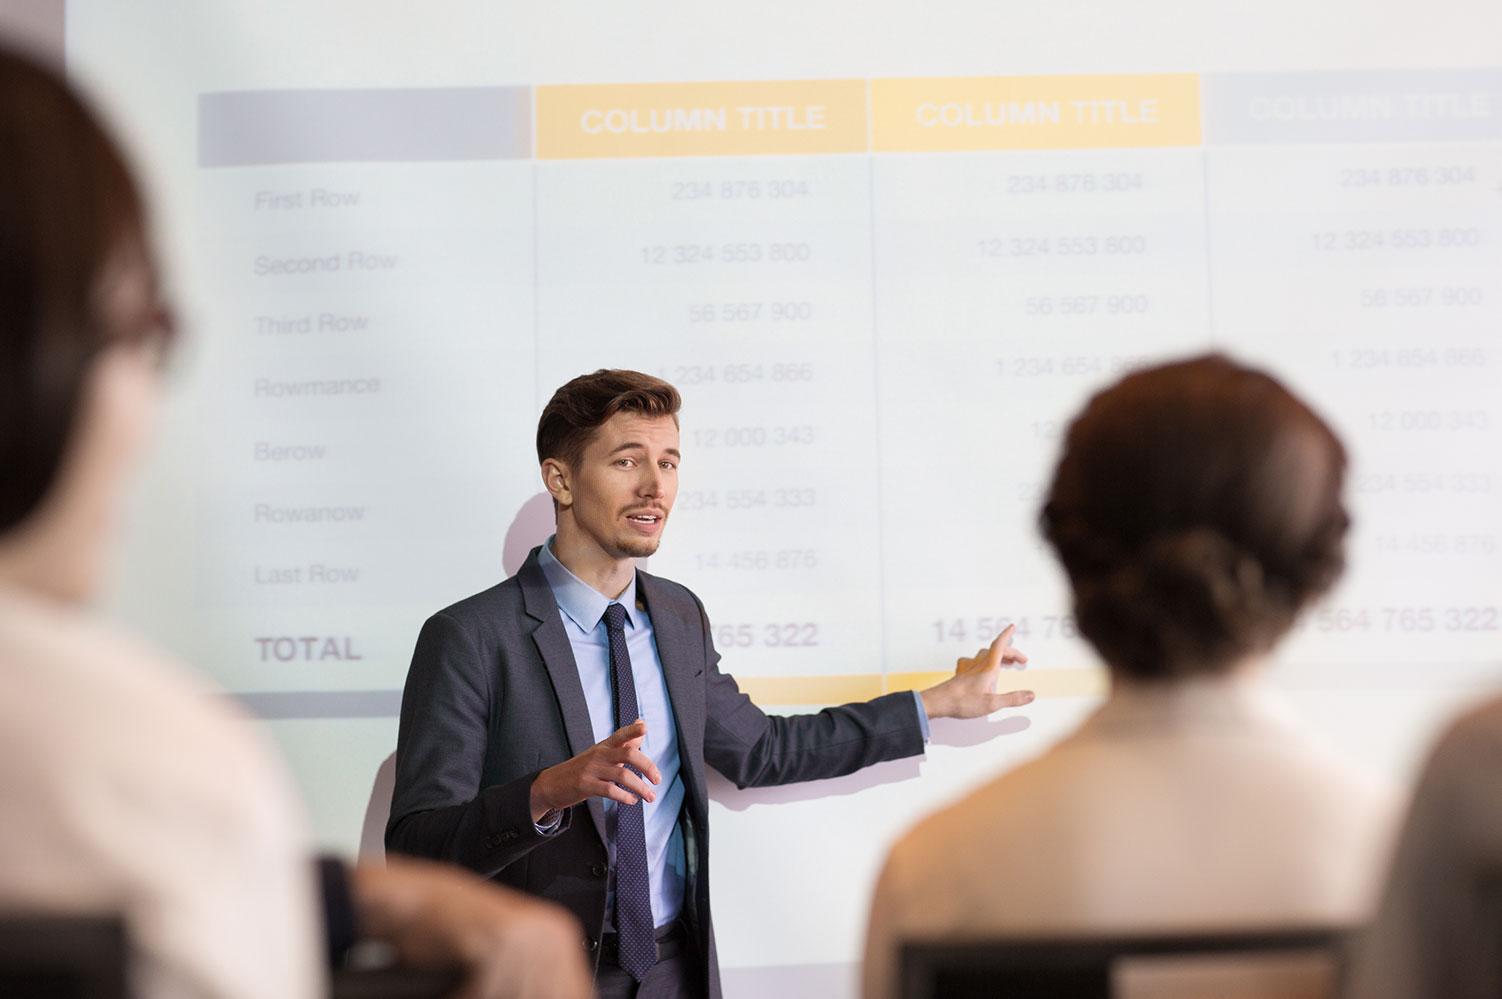 PowerPoint Tipps. wie viele Folien pro Präsentation